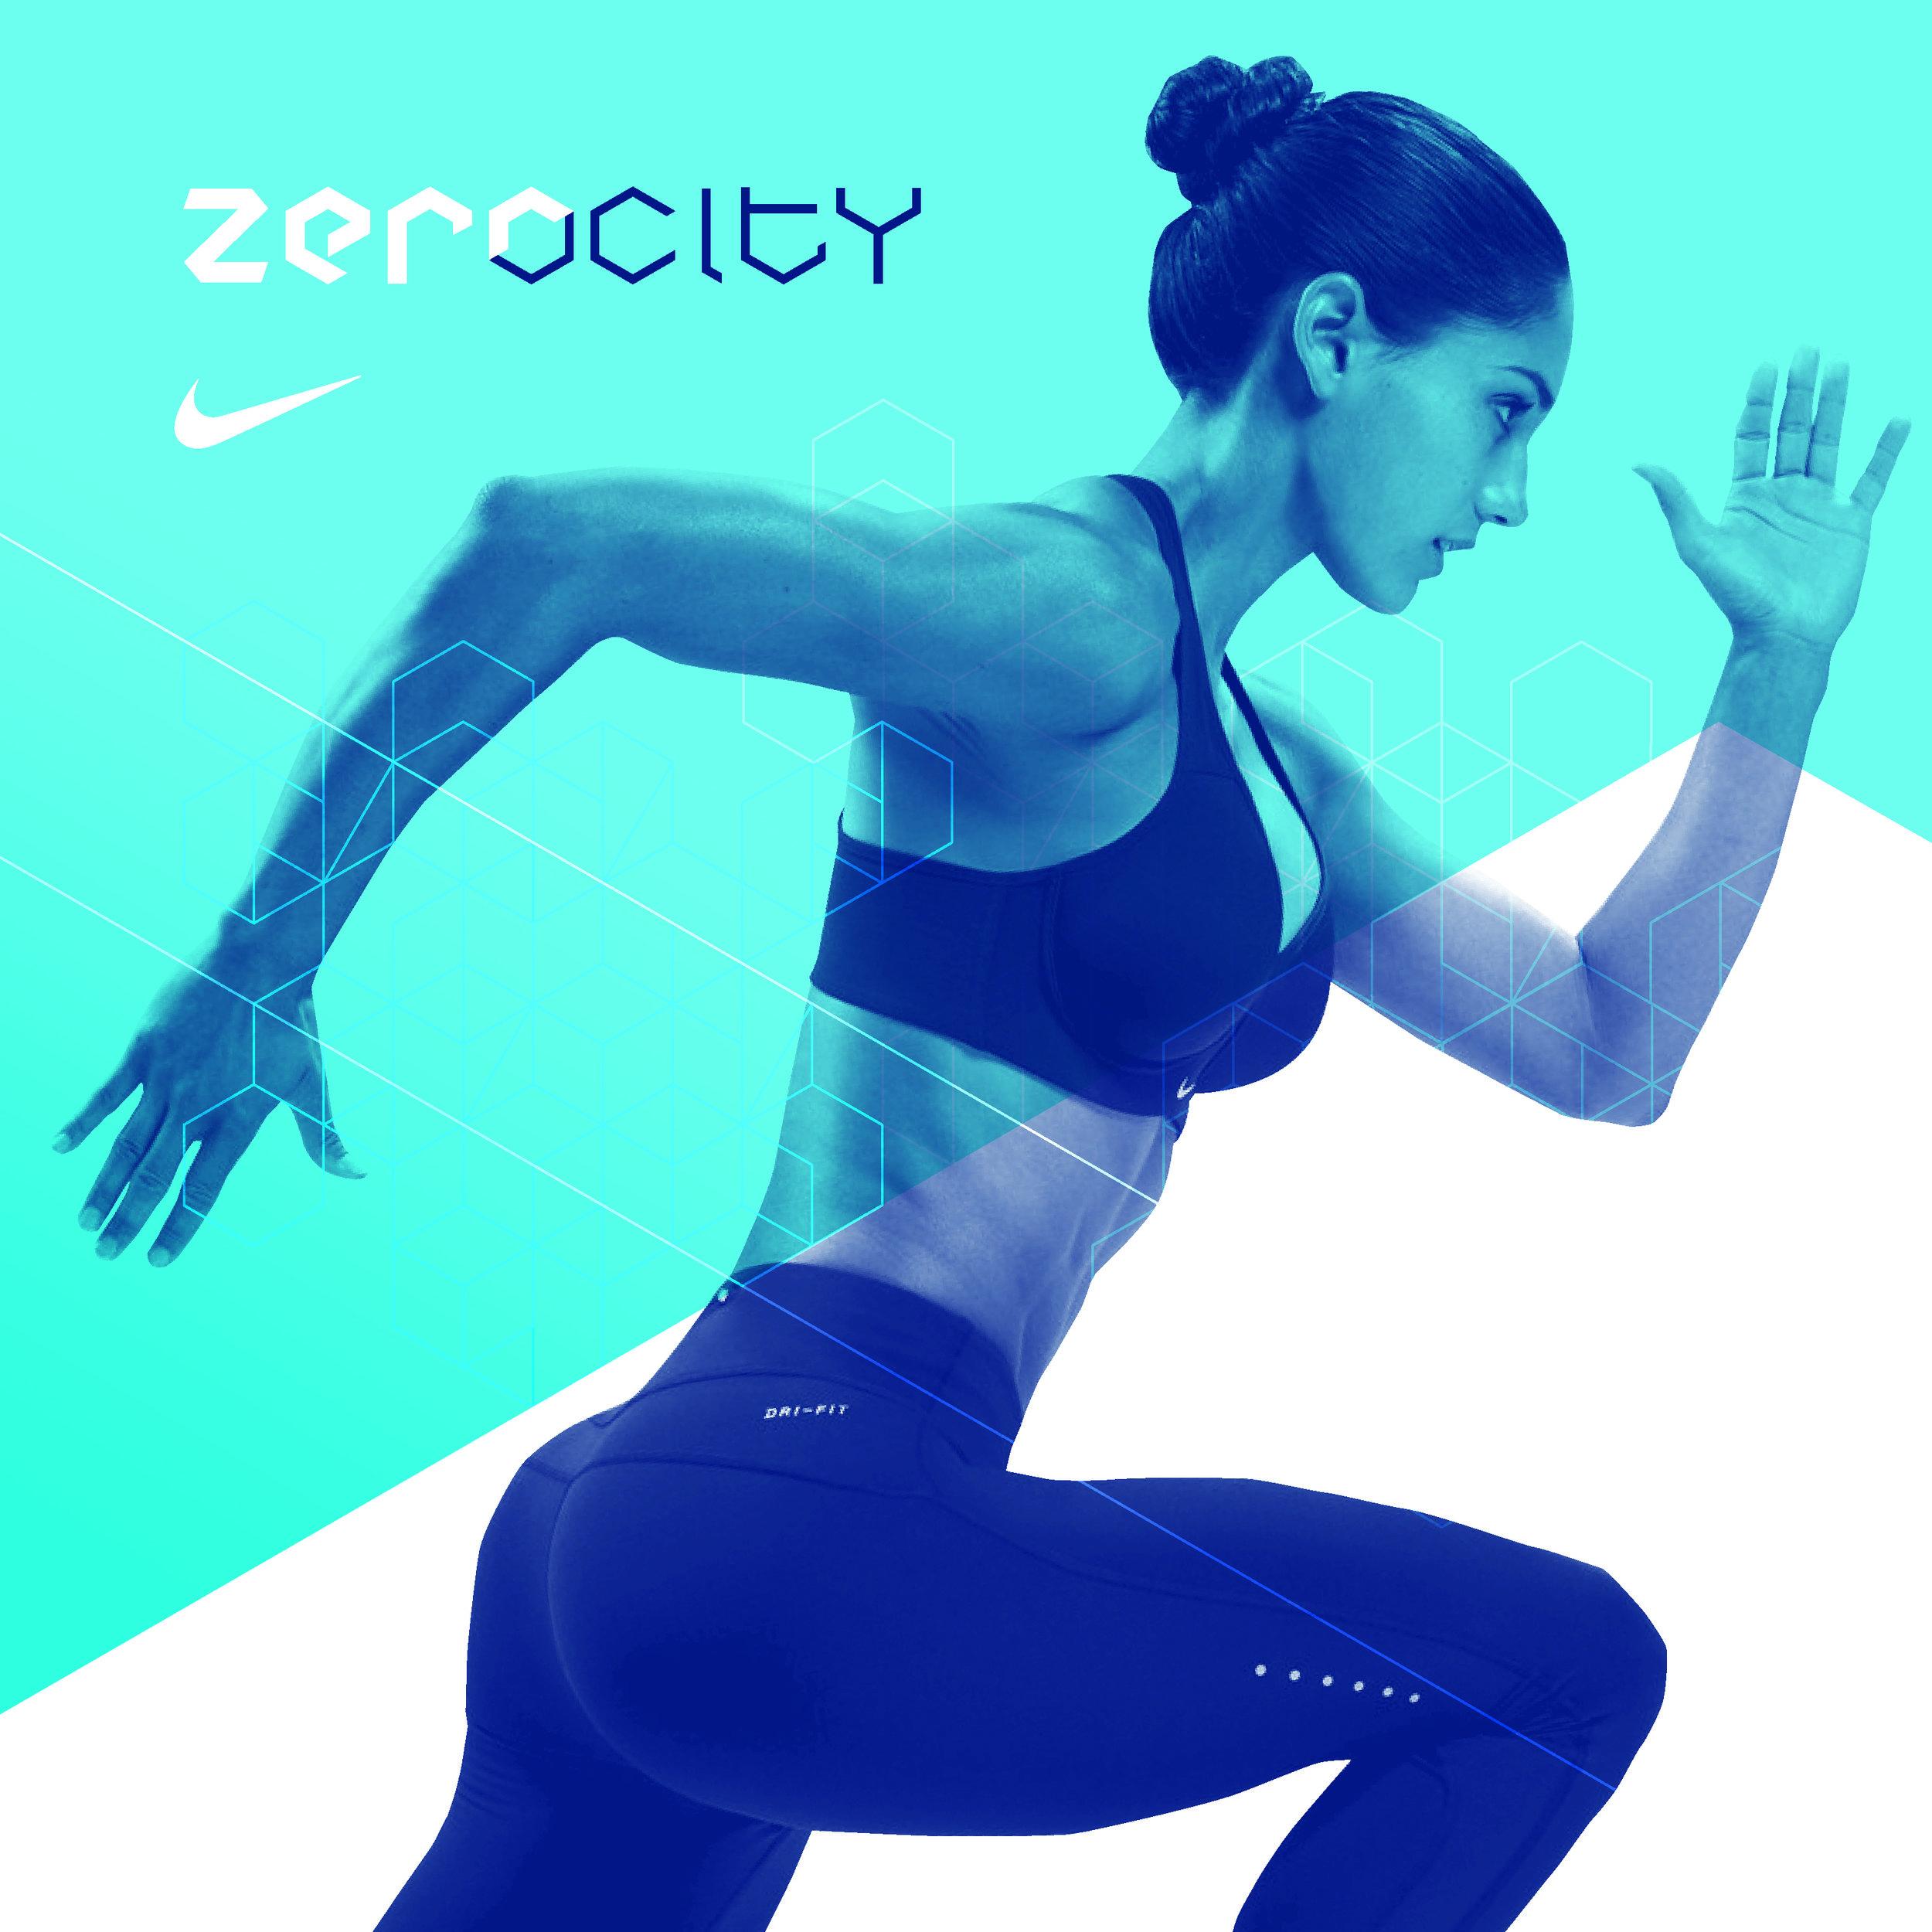 NIKE | Zerocity